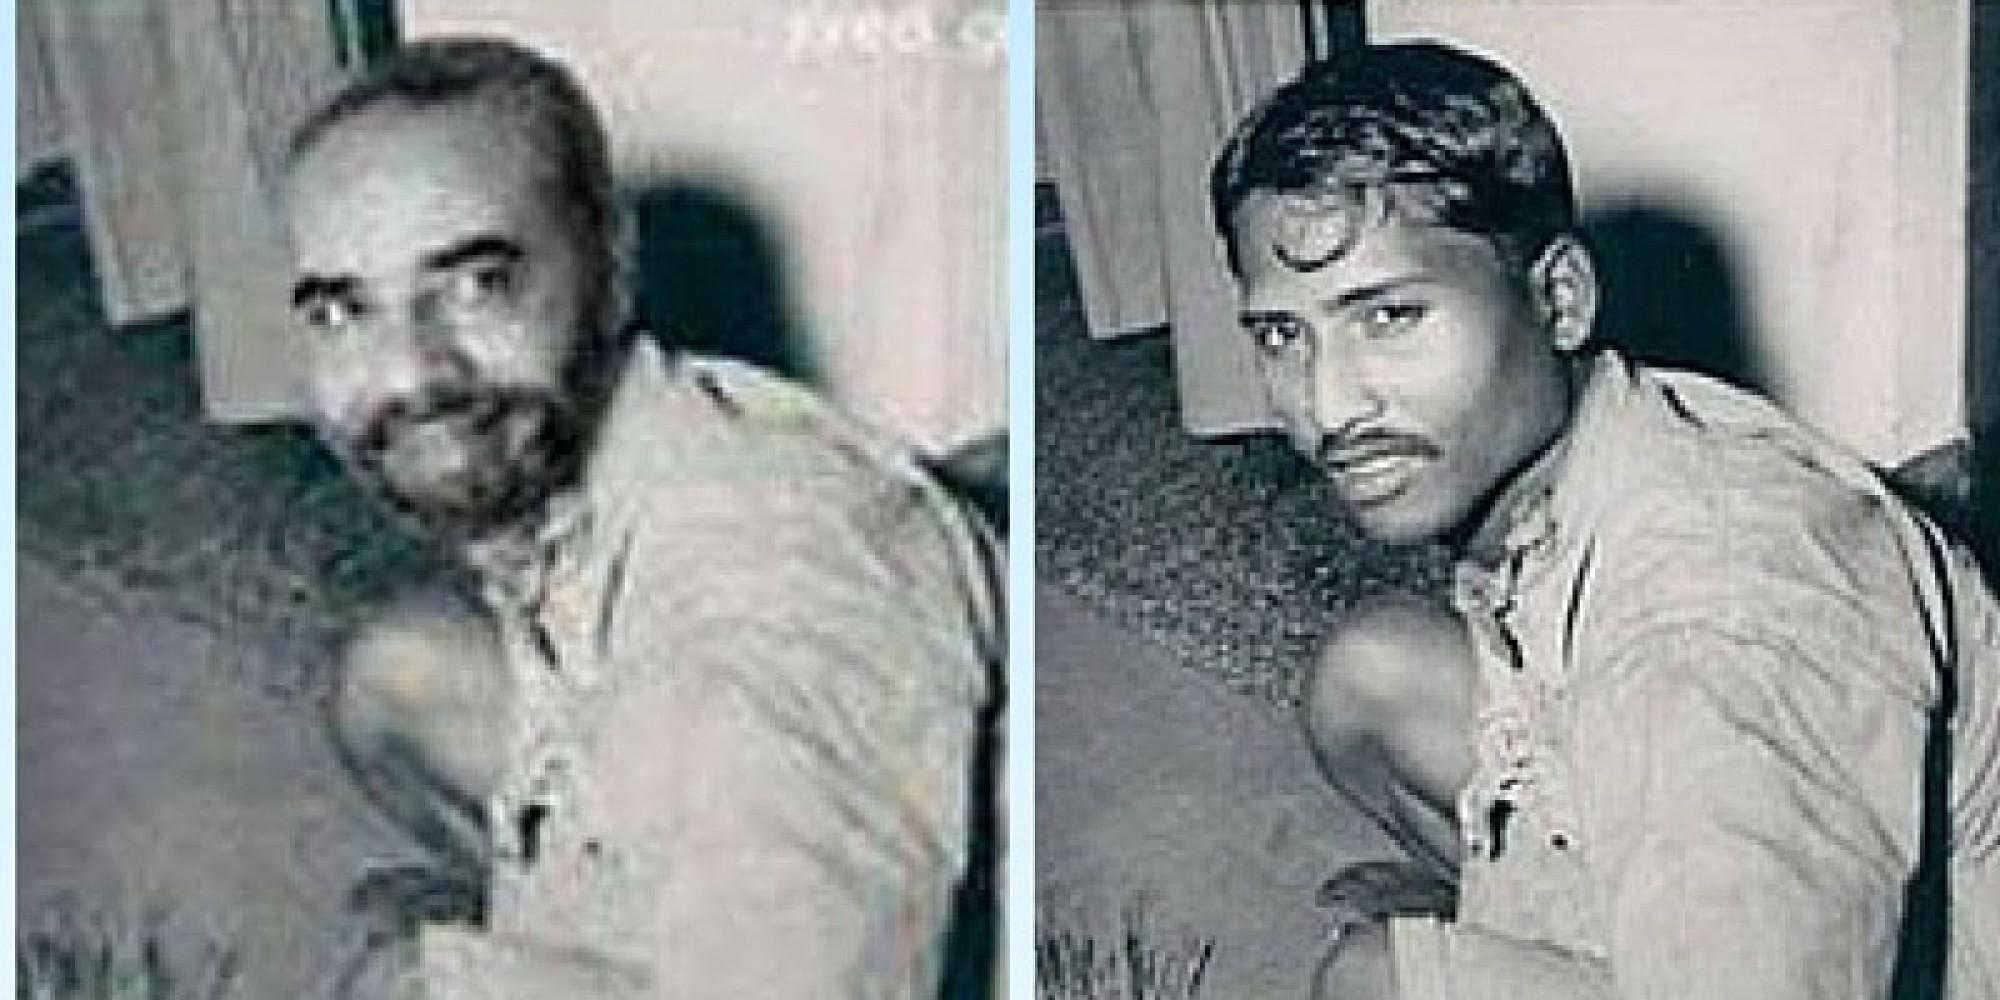 Learn photoshop bhopal